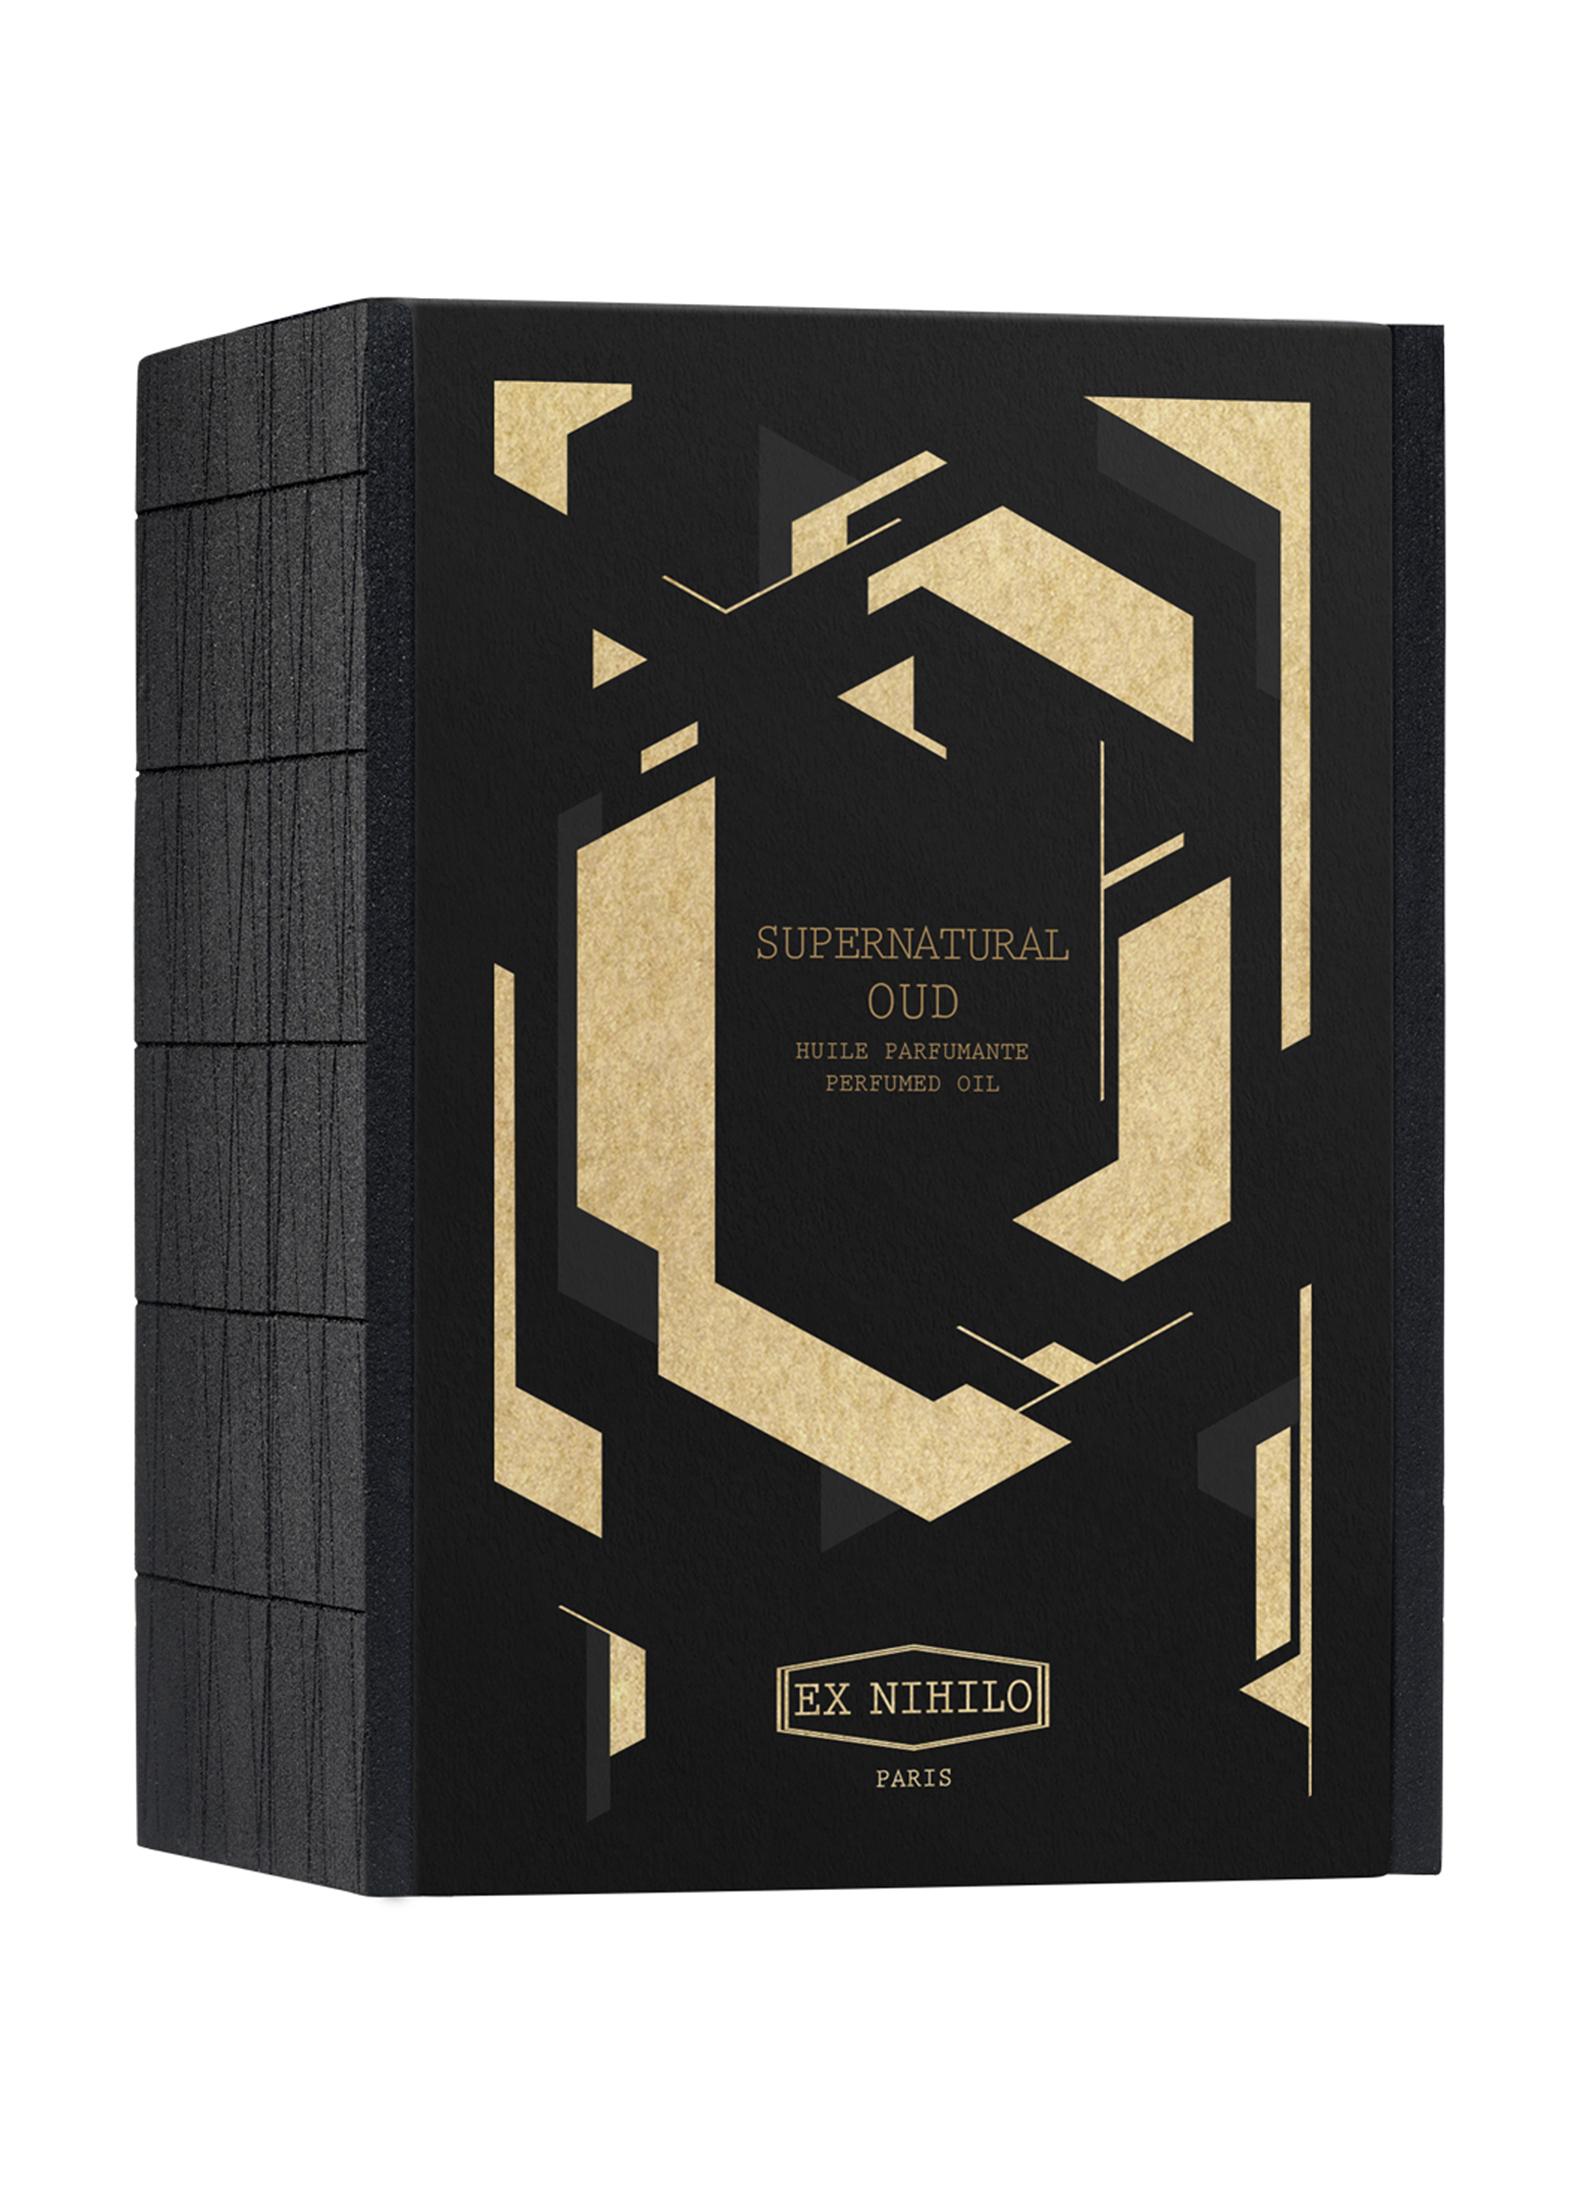 Supernatural Oud Perfume Oil 15ml image number 1